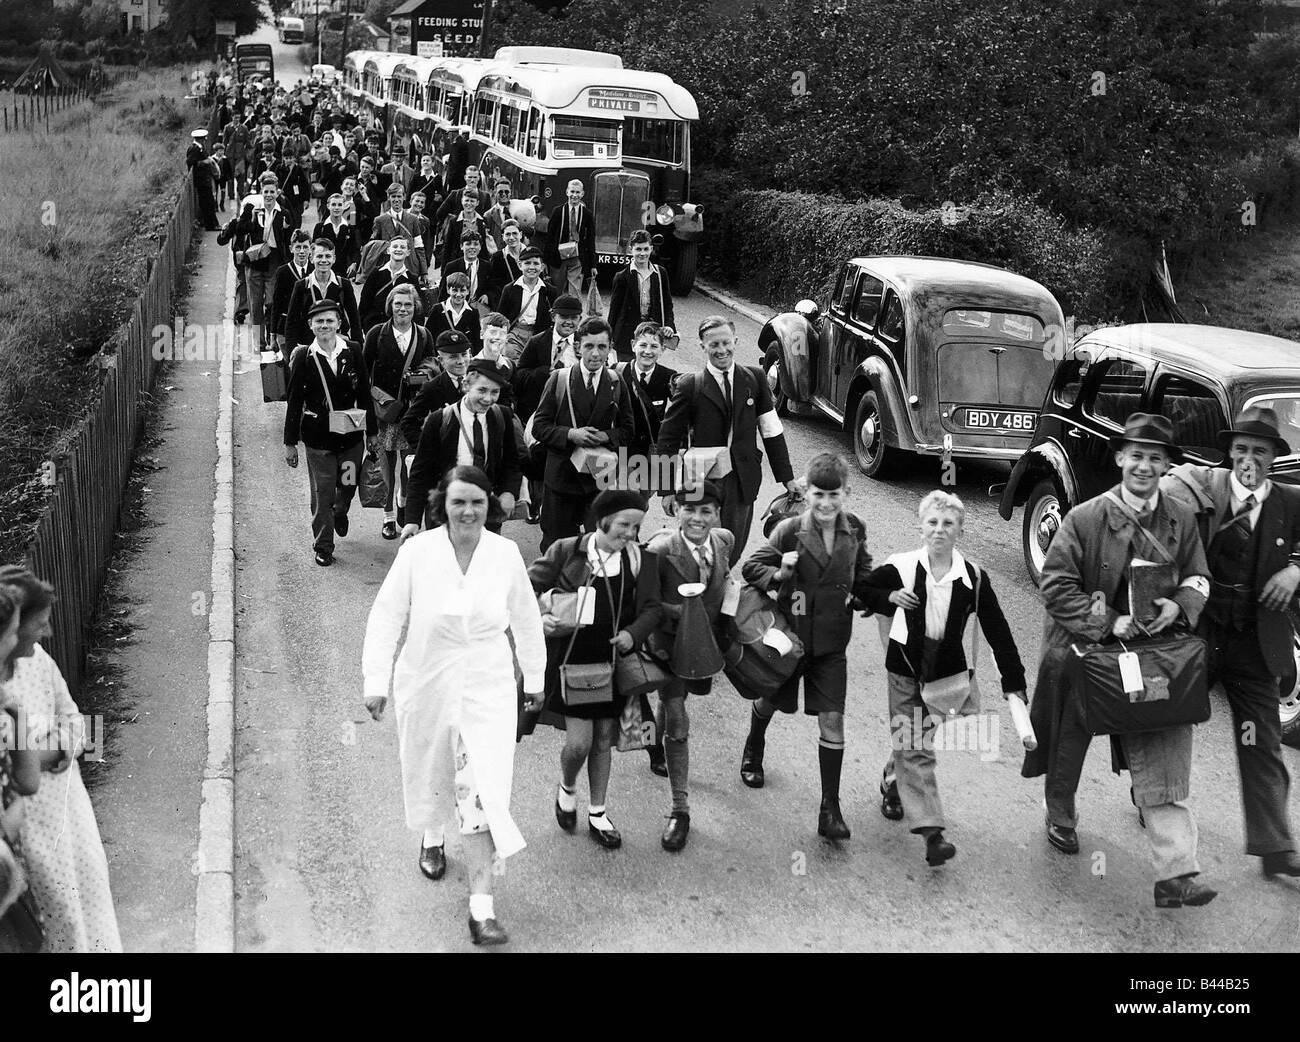 Schoolchildren evacuated from London during WW2 air raids 1939 - Stock Image